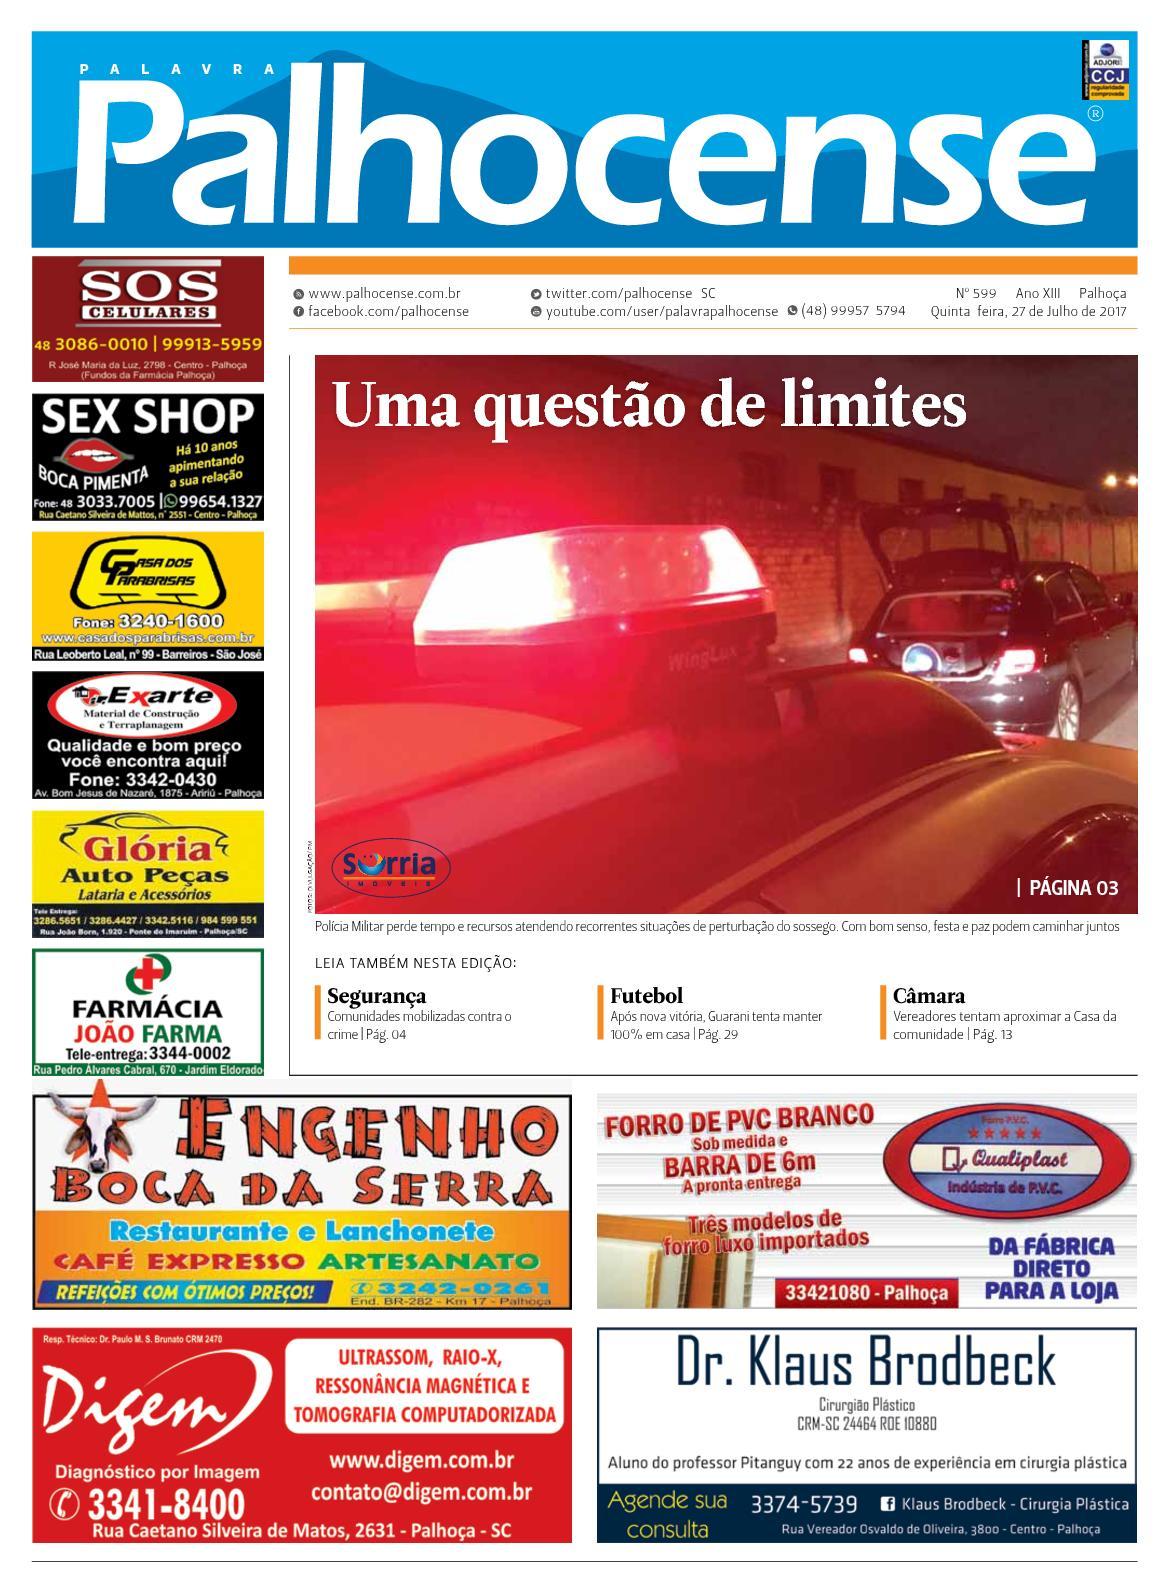 JORNAL PALAVRA PALHOCENSE - EDIÇÃO 599